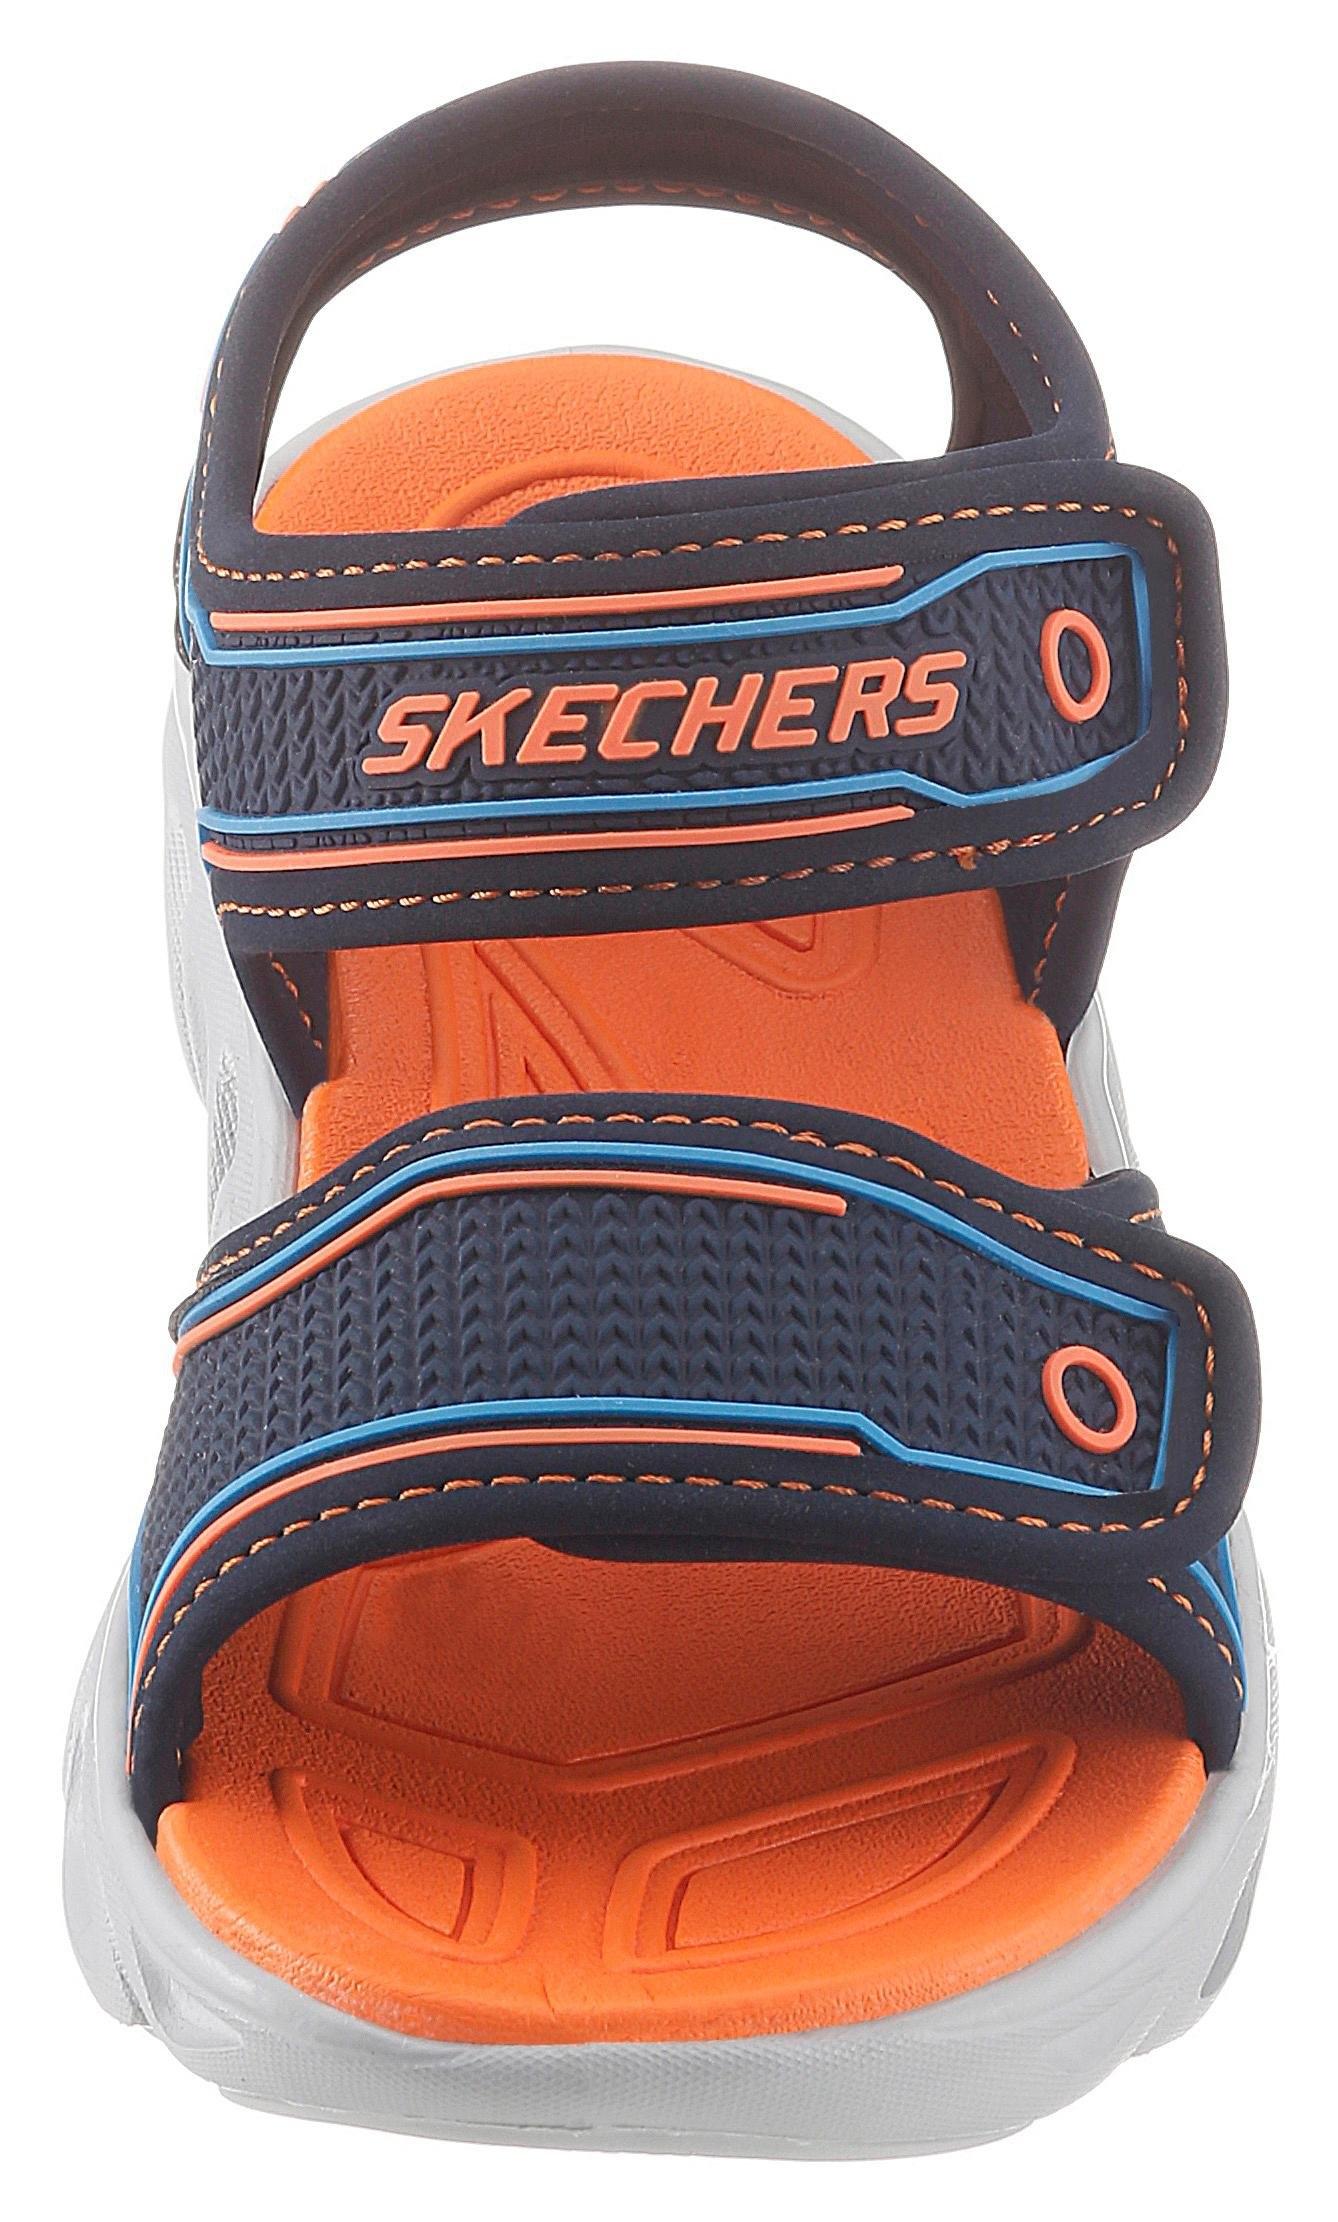 Skechers Kids sandalen »Blinkschuh Hypno-Splash Lighted« voordelig en veilig online kopen